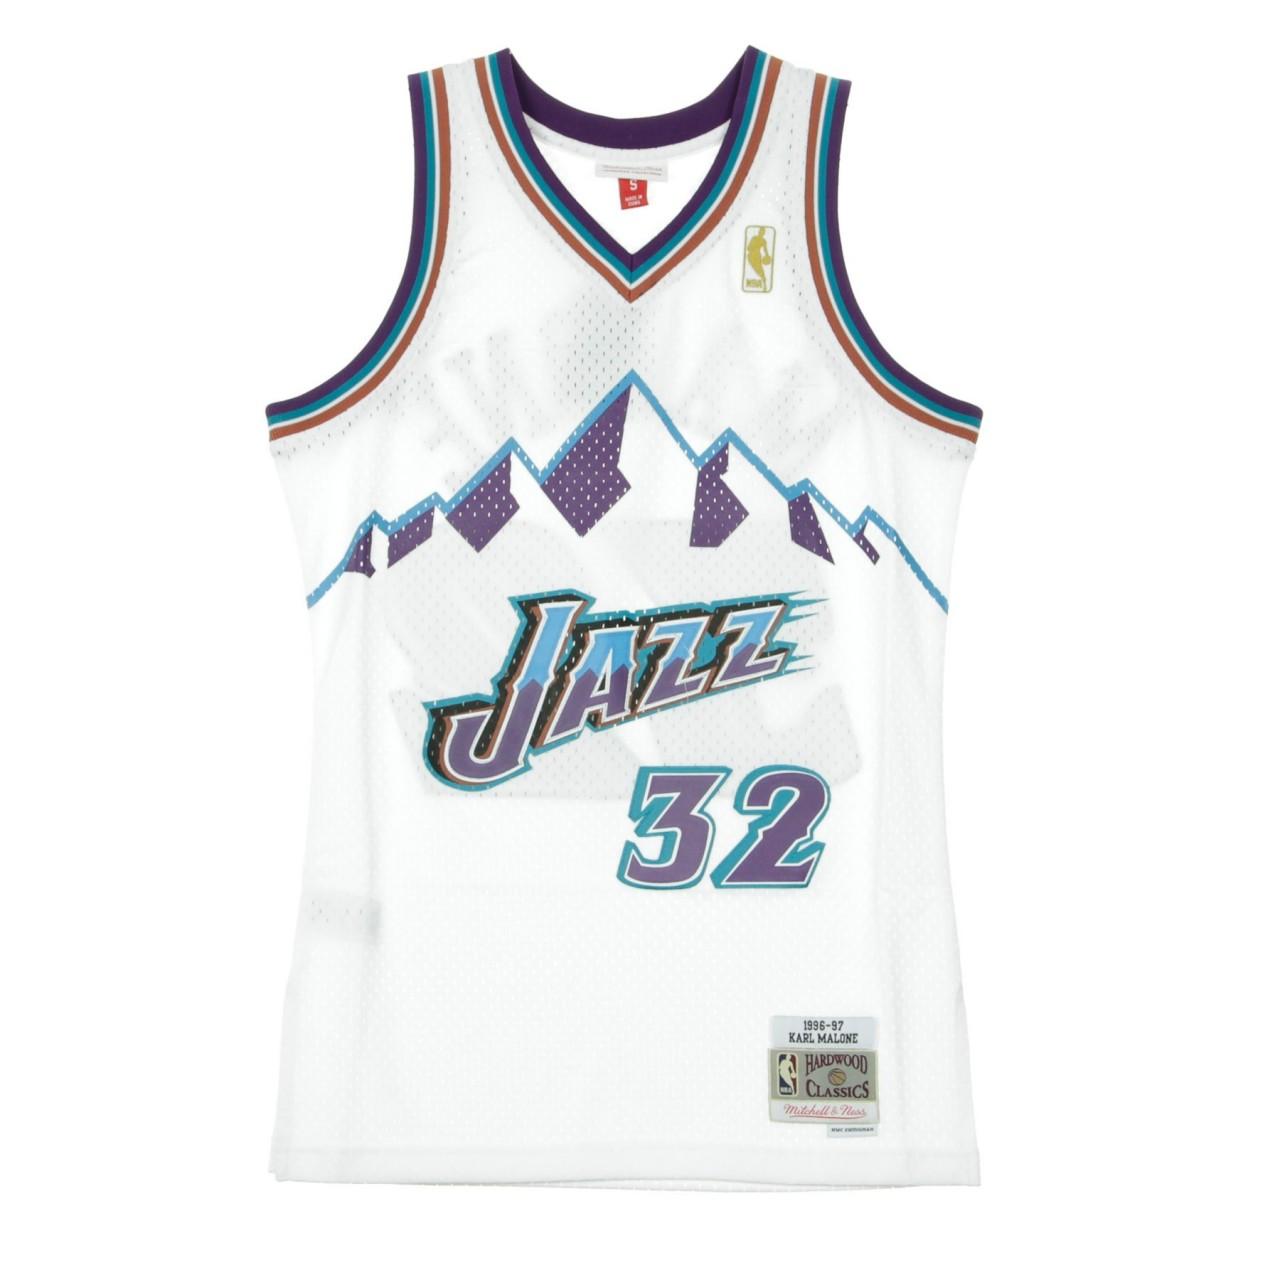 MITCHELL & NESS NBA SWINGMAN JERSEY KARL MALONE NO.32 1996/97 UTAJAZ HOME MN-NBA-353J-3D9-FGYKMA-UTAJAZ-